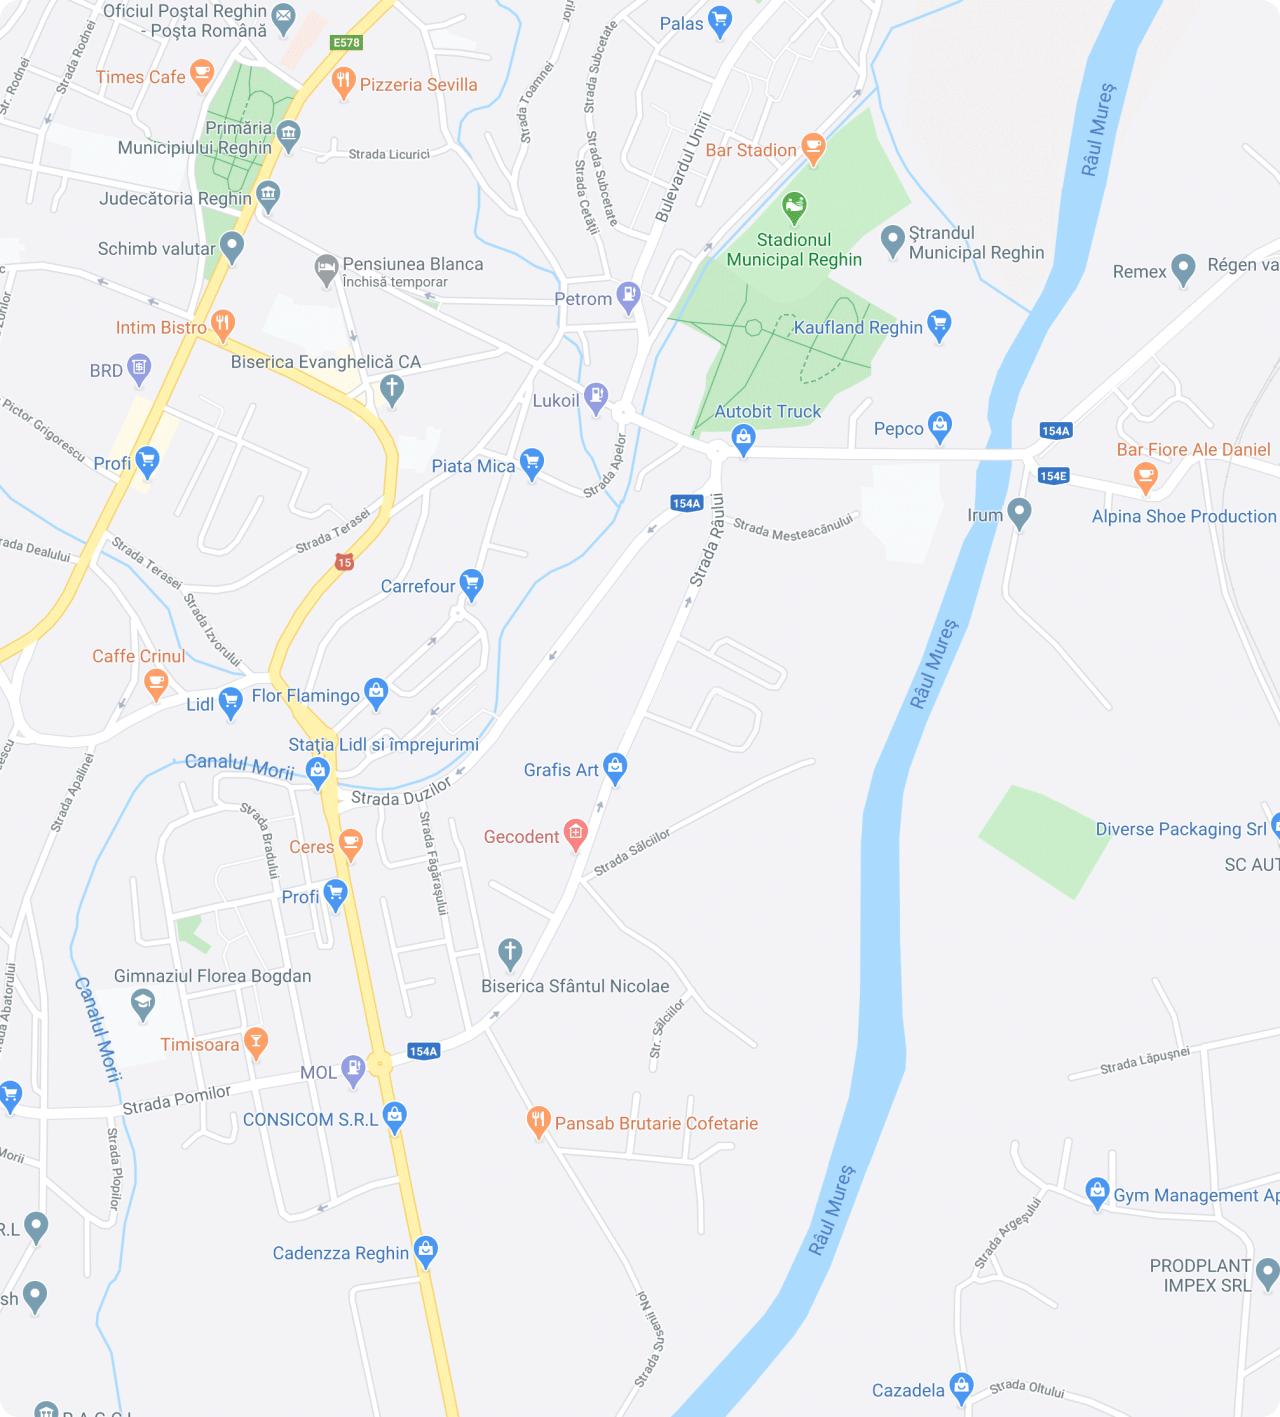 https://river-park.ro/content/uploads/2020/06/rpmap-1280x1417-1.png